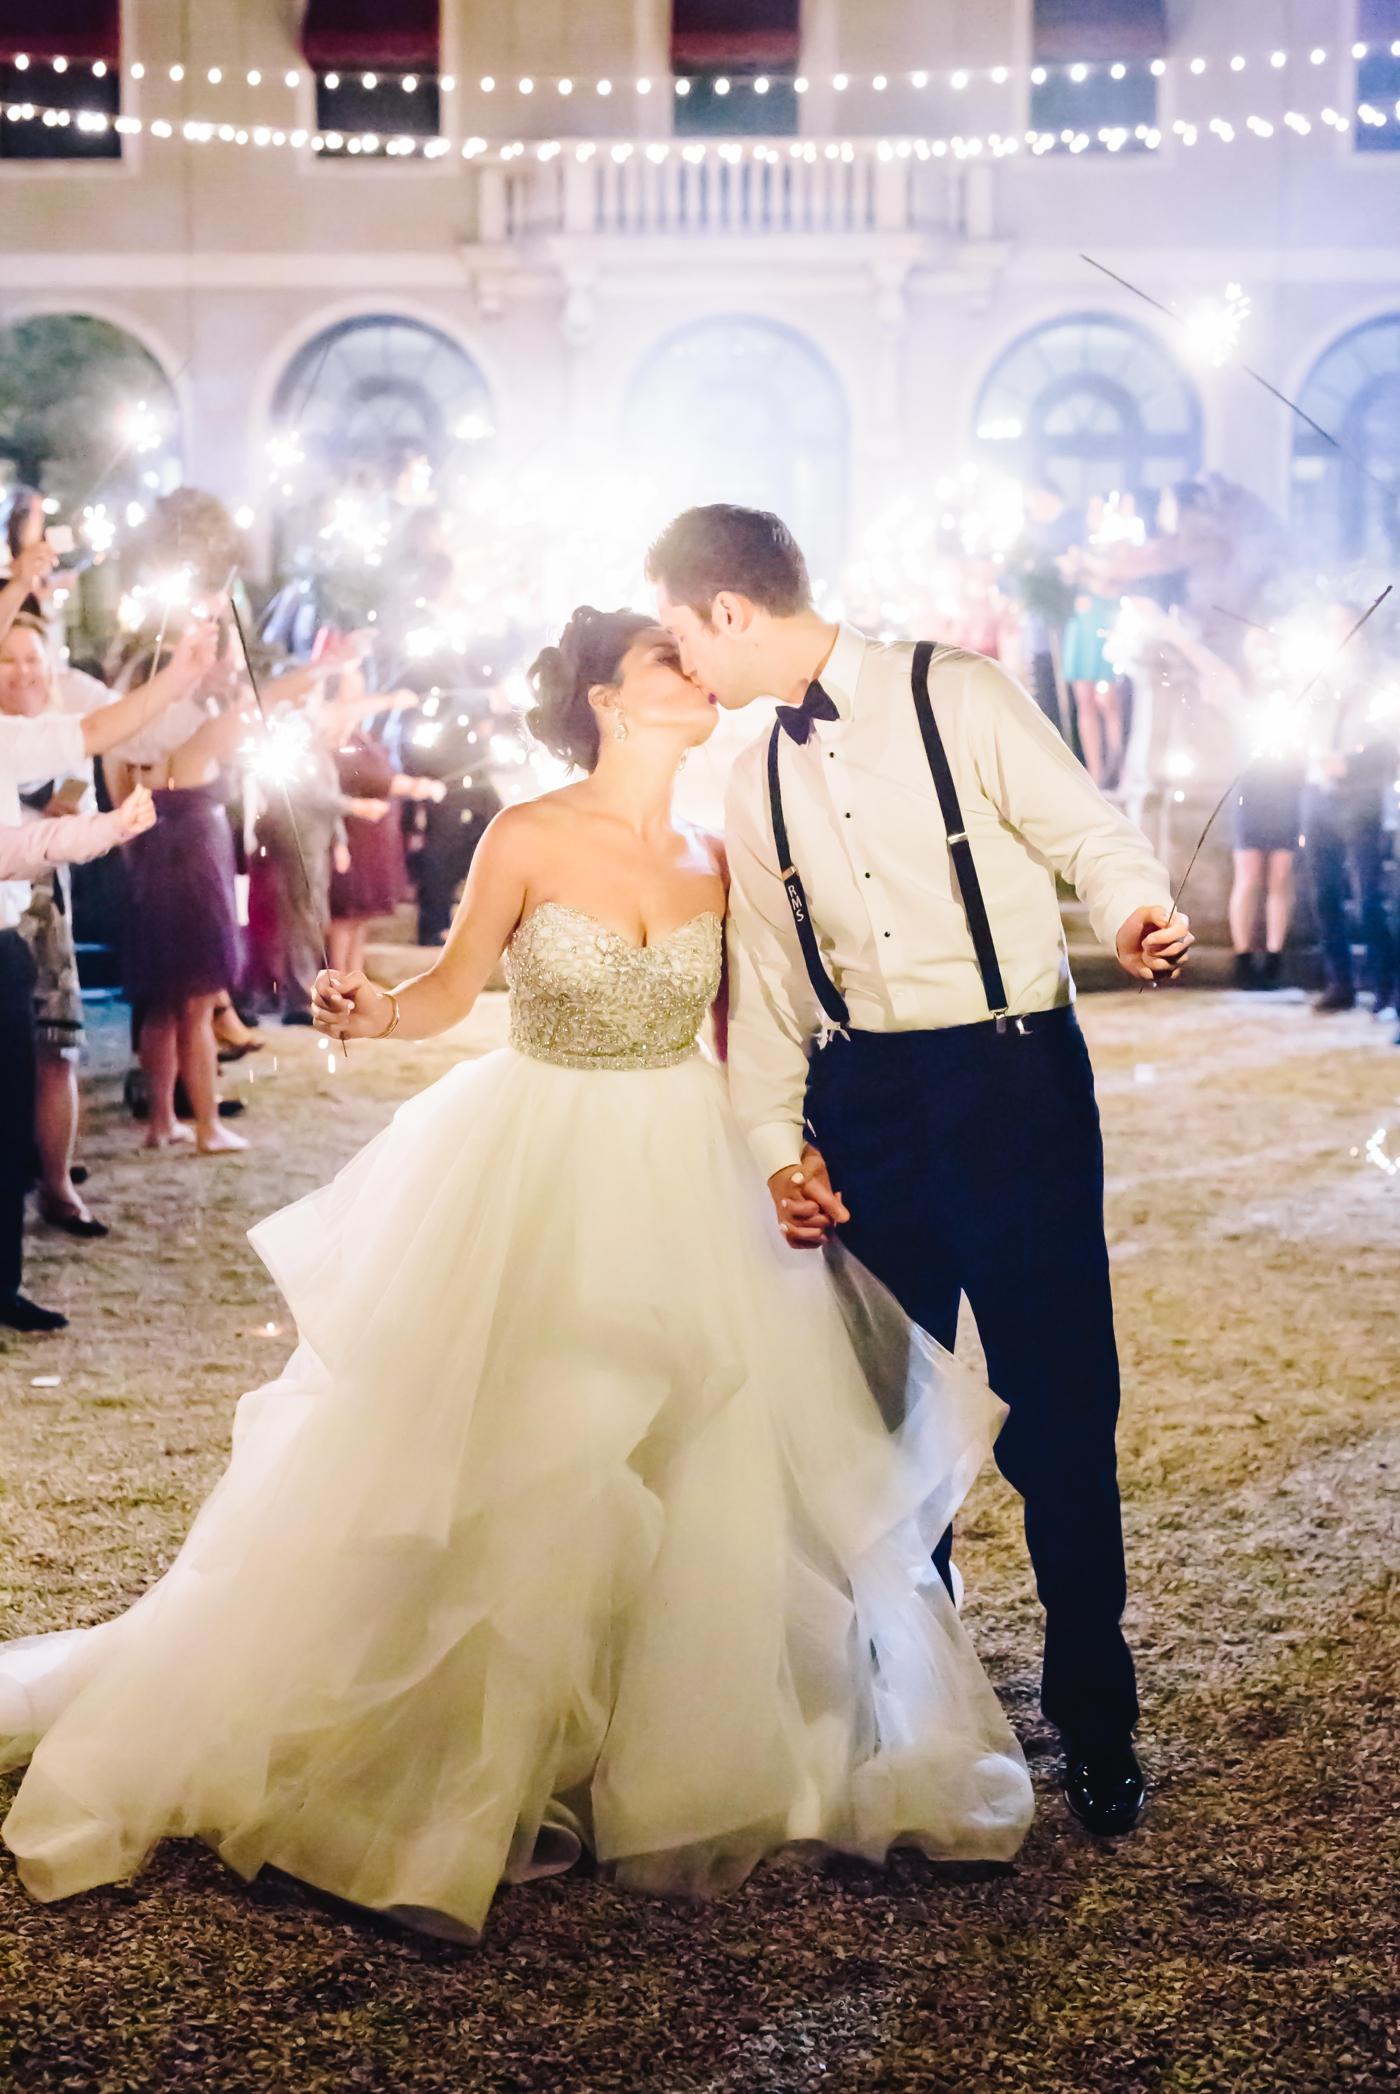 chicago-fine-art-wedding-photography-smeja60